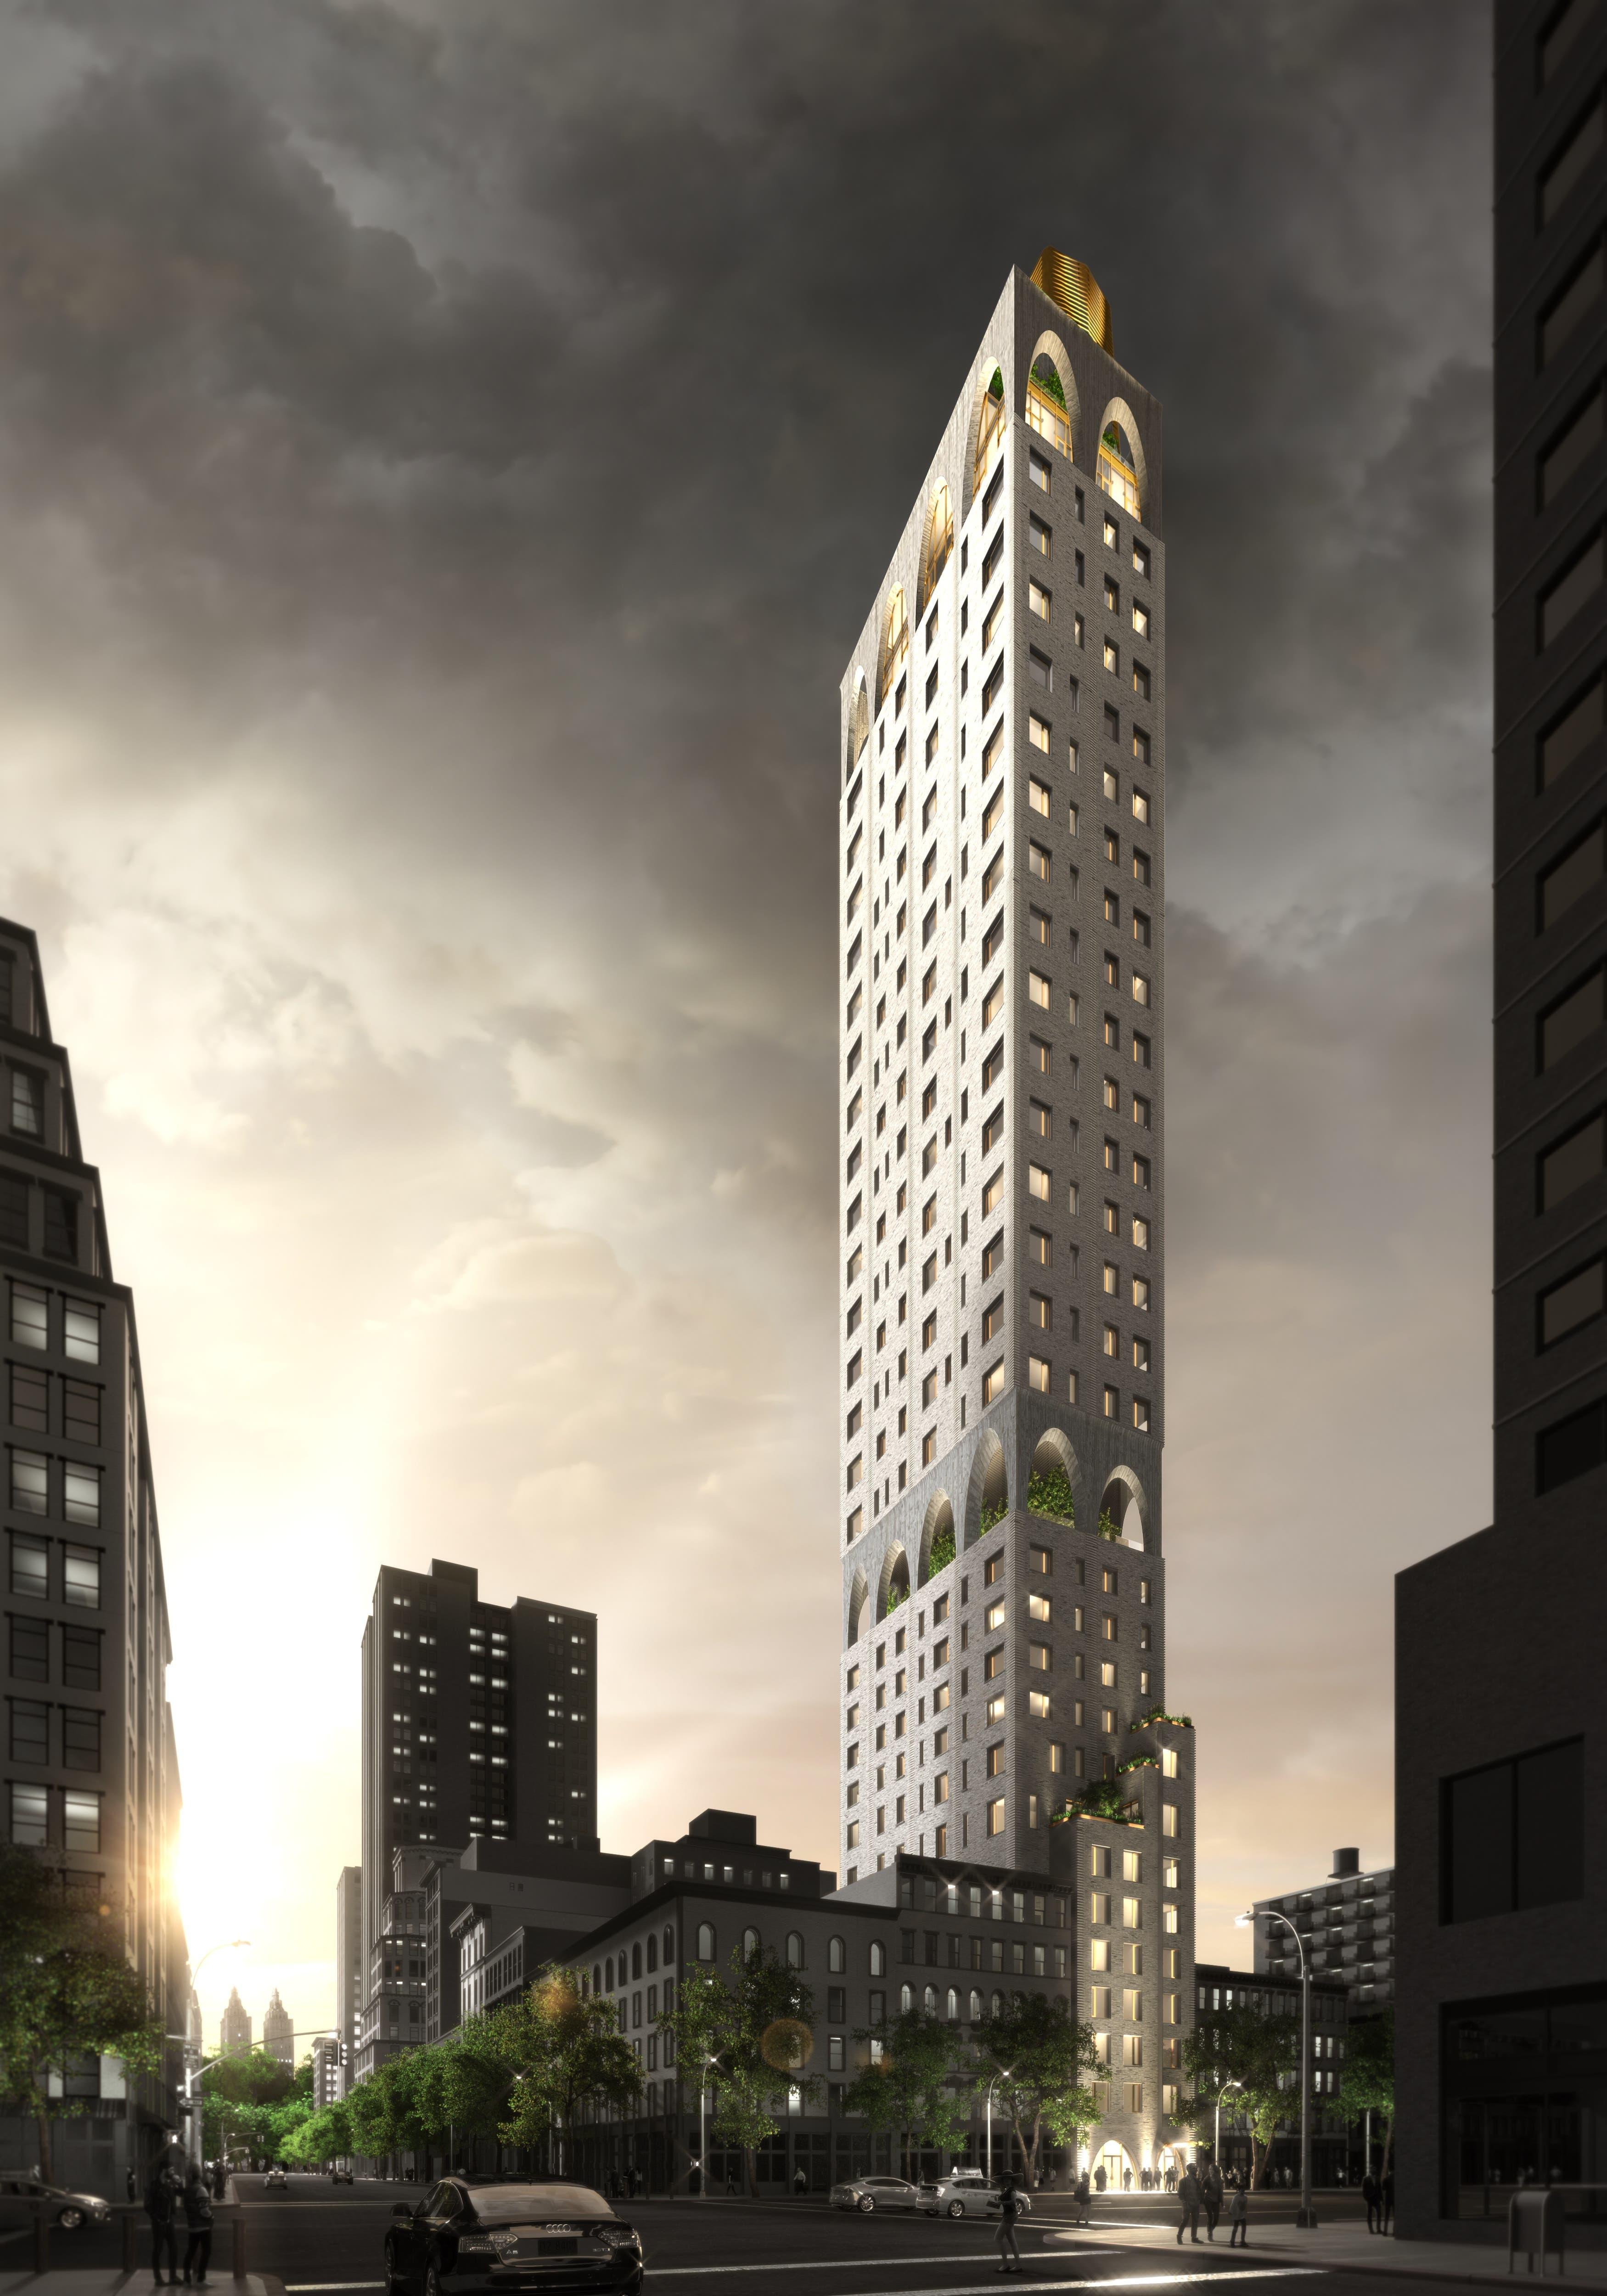 Auf das Projekt 180 East 88th Street in New York City ist Balz Arrigoni besonders stolz.